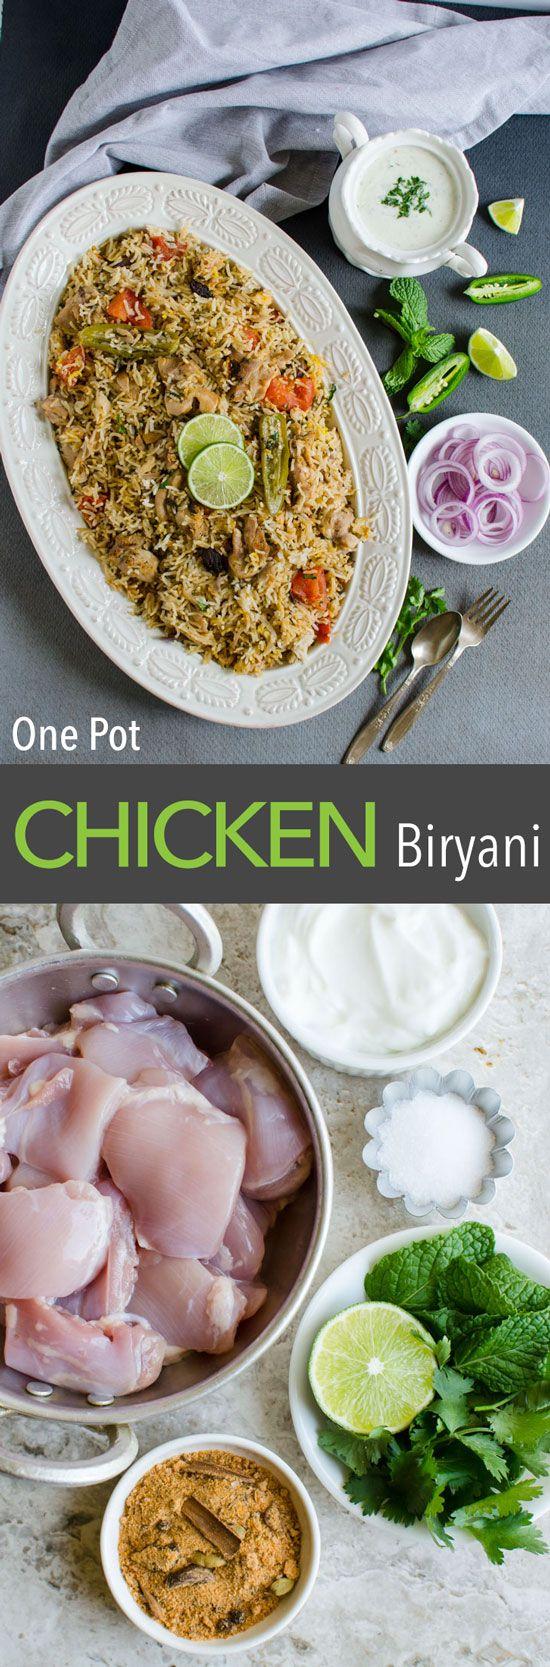 One Pot Easy Chicken Biryani